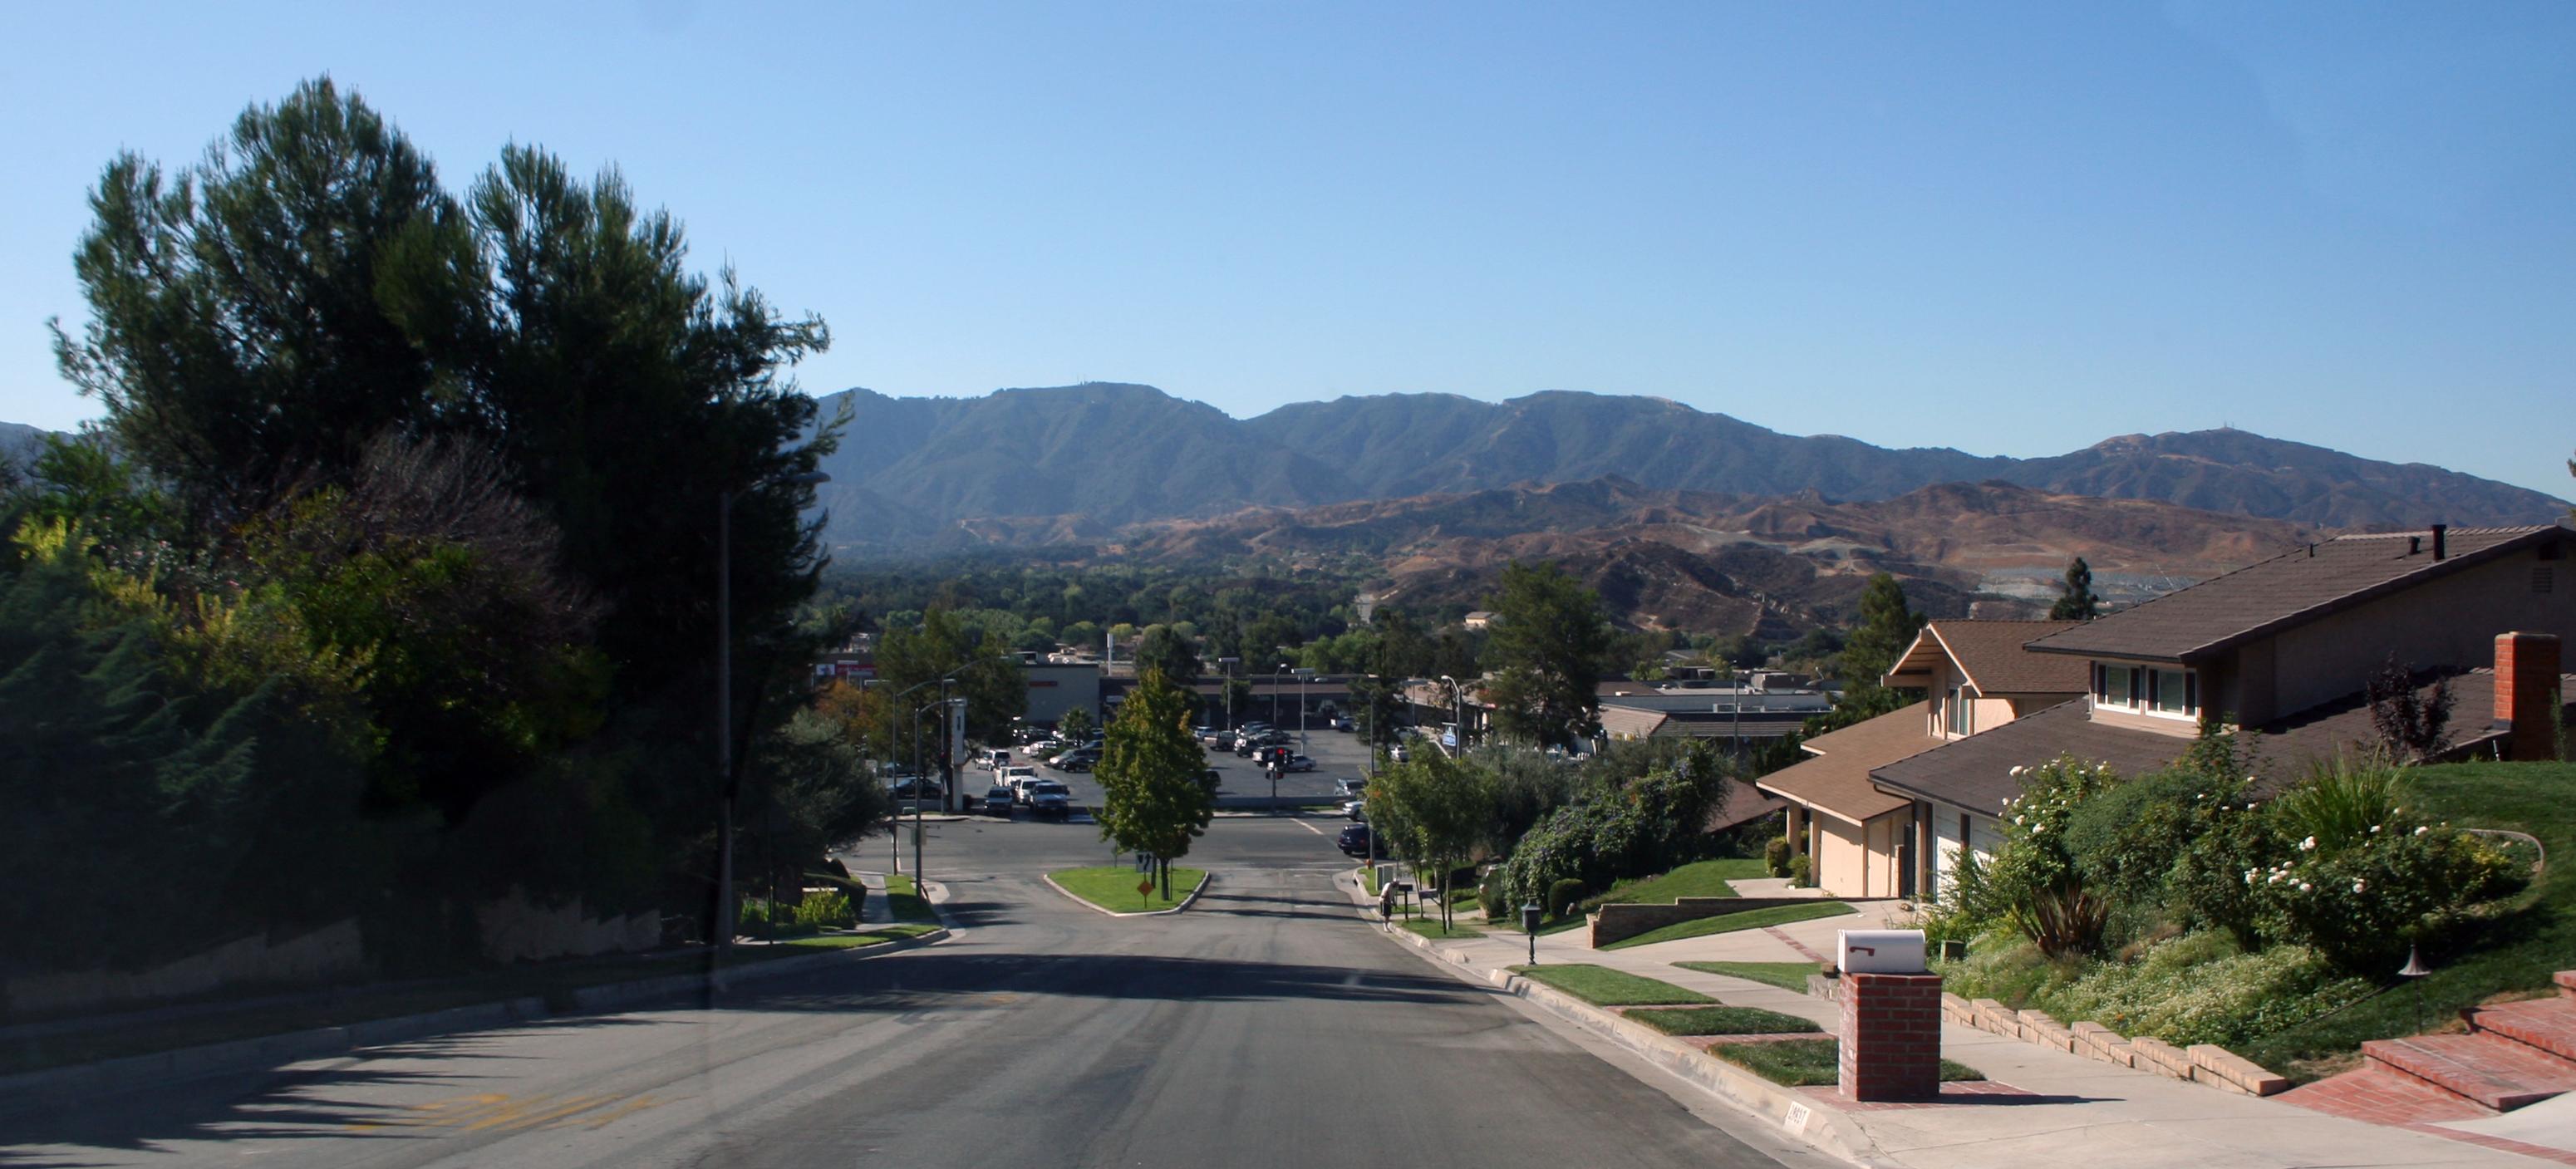 Valley Santa Clarita